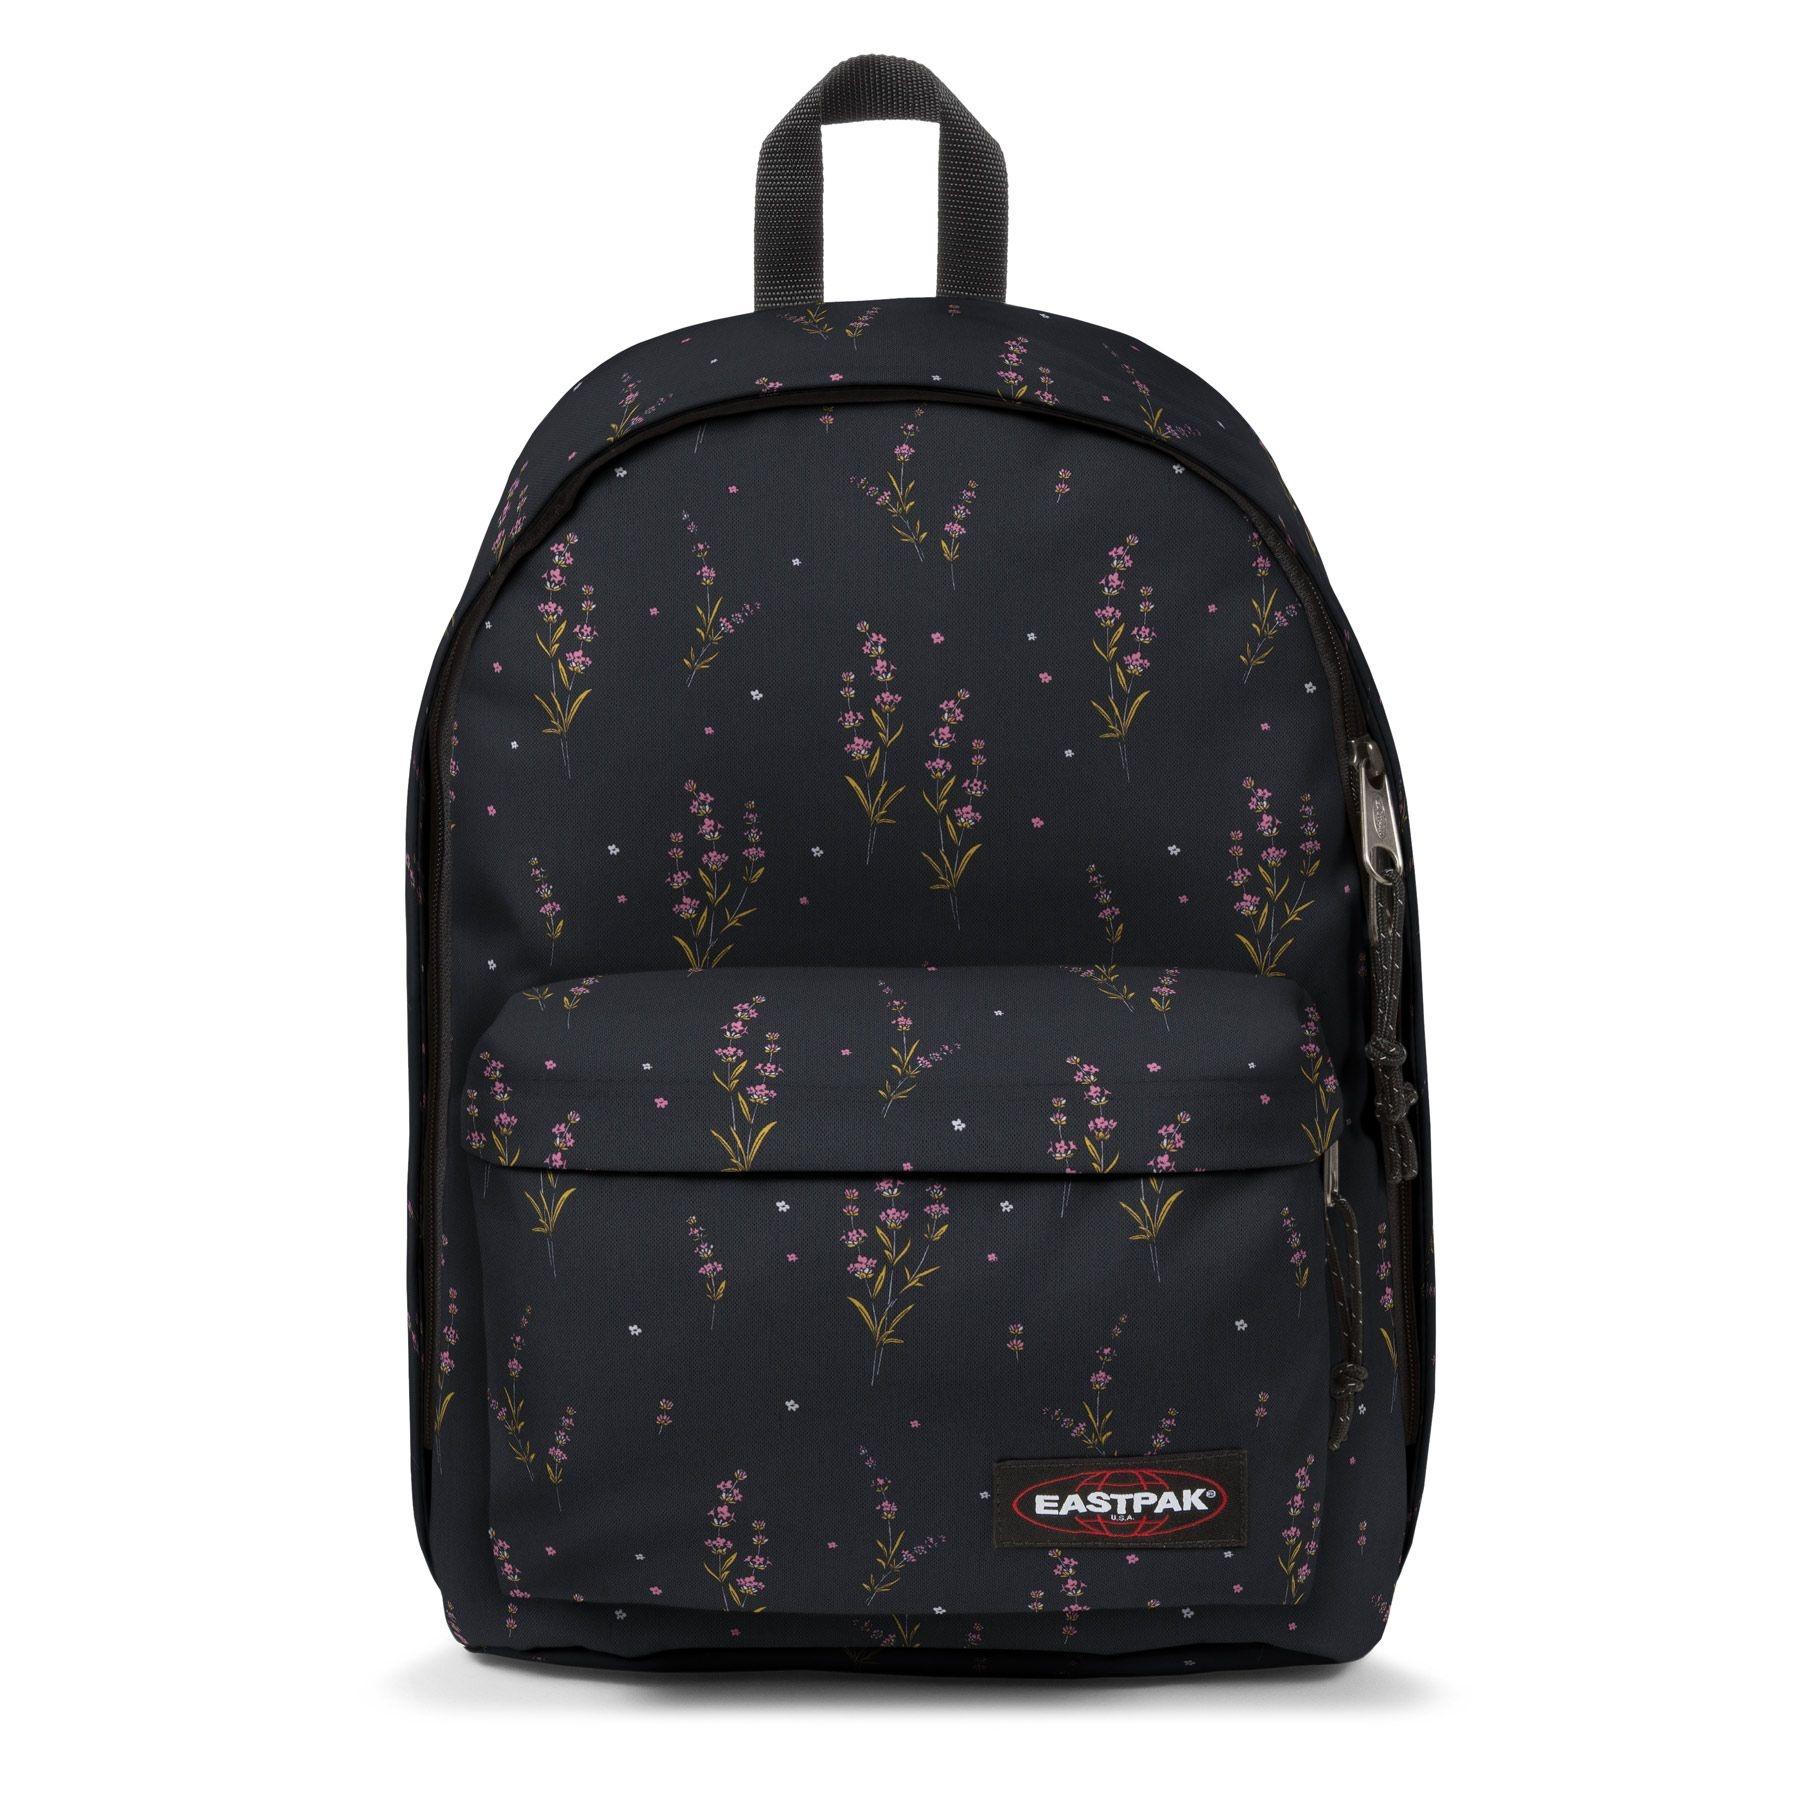 Eastpak Eastpak Out Of Office Wild Black 15 inch laptop rugtas